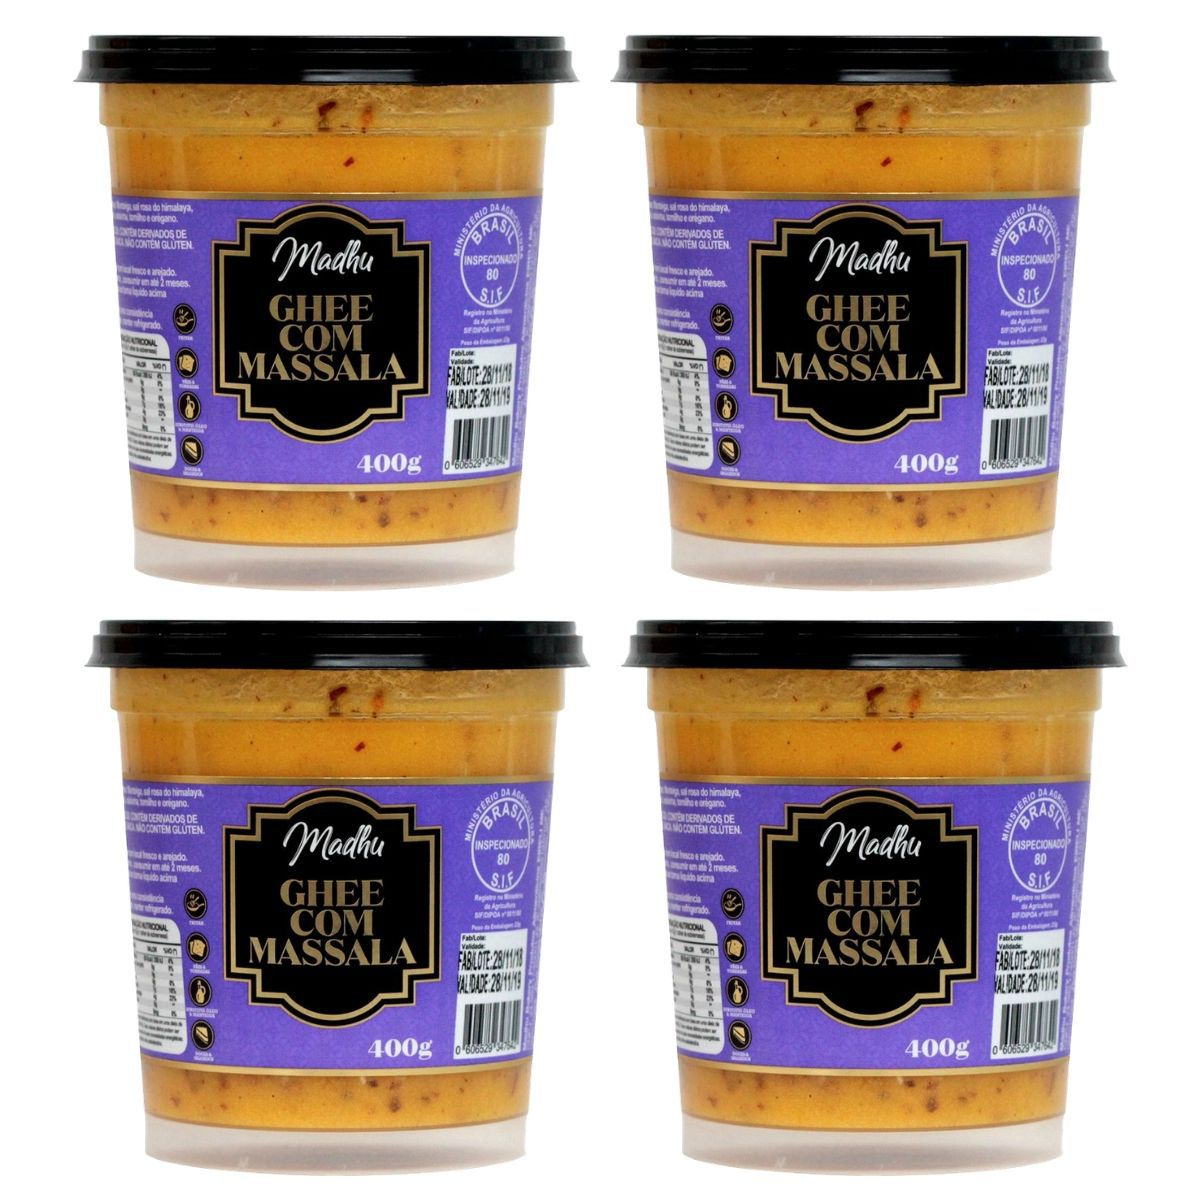 Kit 4 Manteigas Ghee C/ Massala Clarificada 400mg - Madhu Bakery